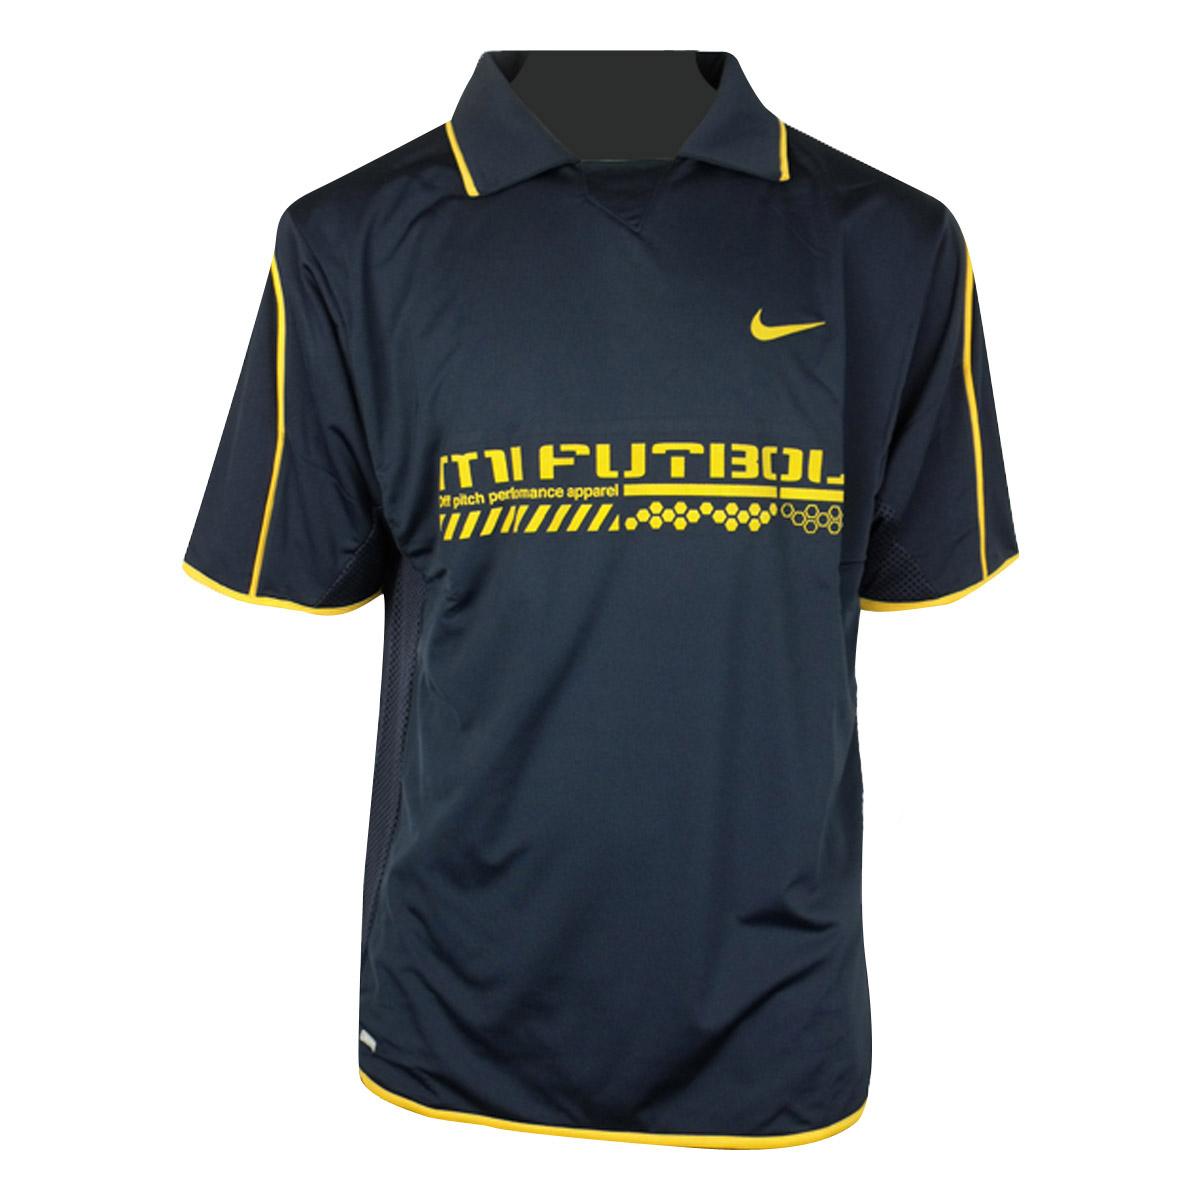 Mens-Nike-Dry-Dri-FIT-Football-Running-Shirt-Training-Top-Gym-Polo-Tee-Size-XS-X